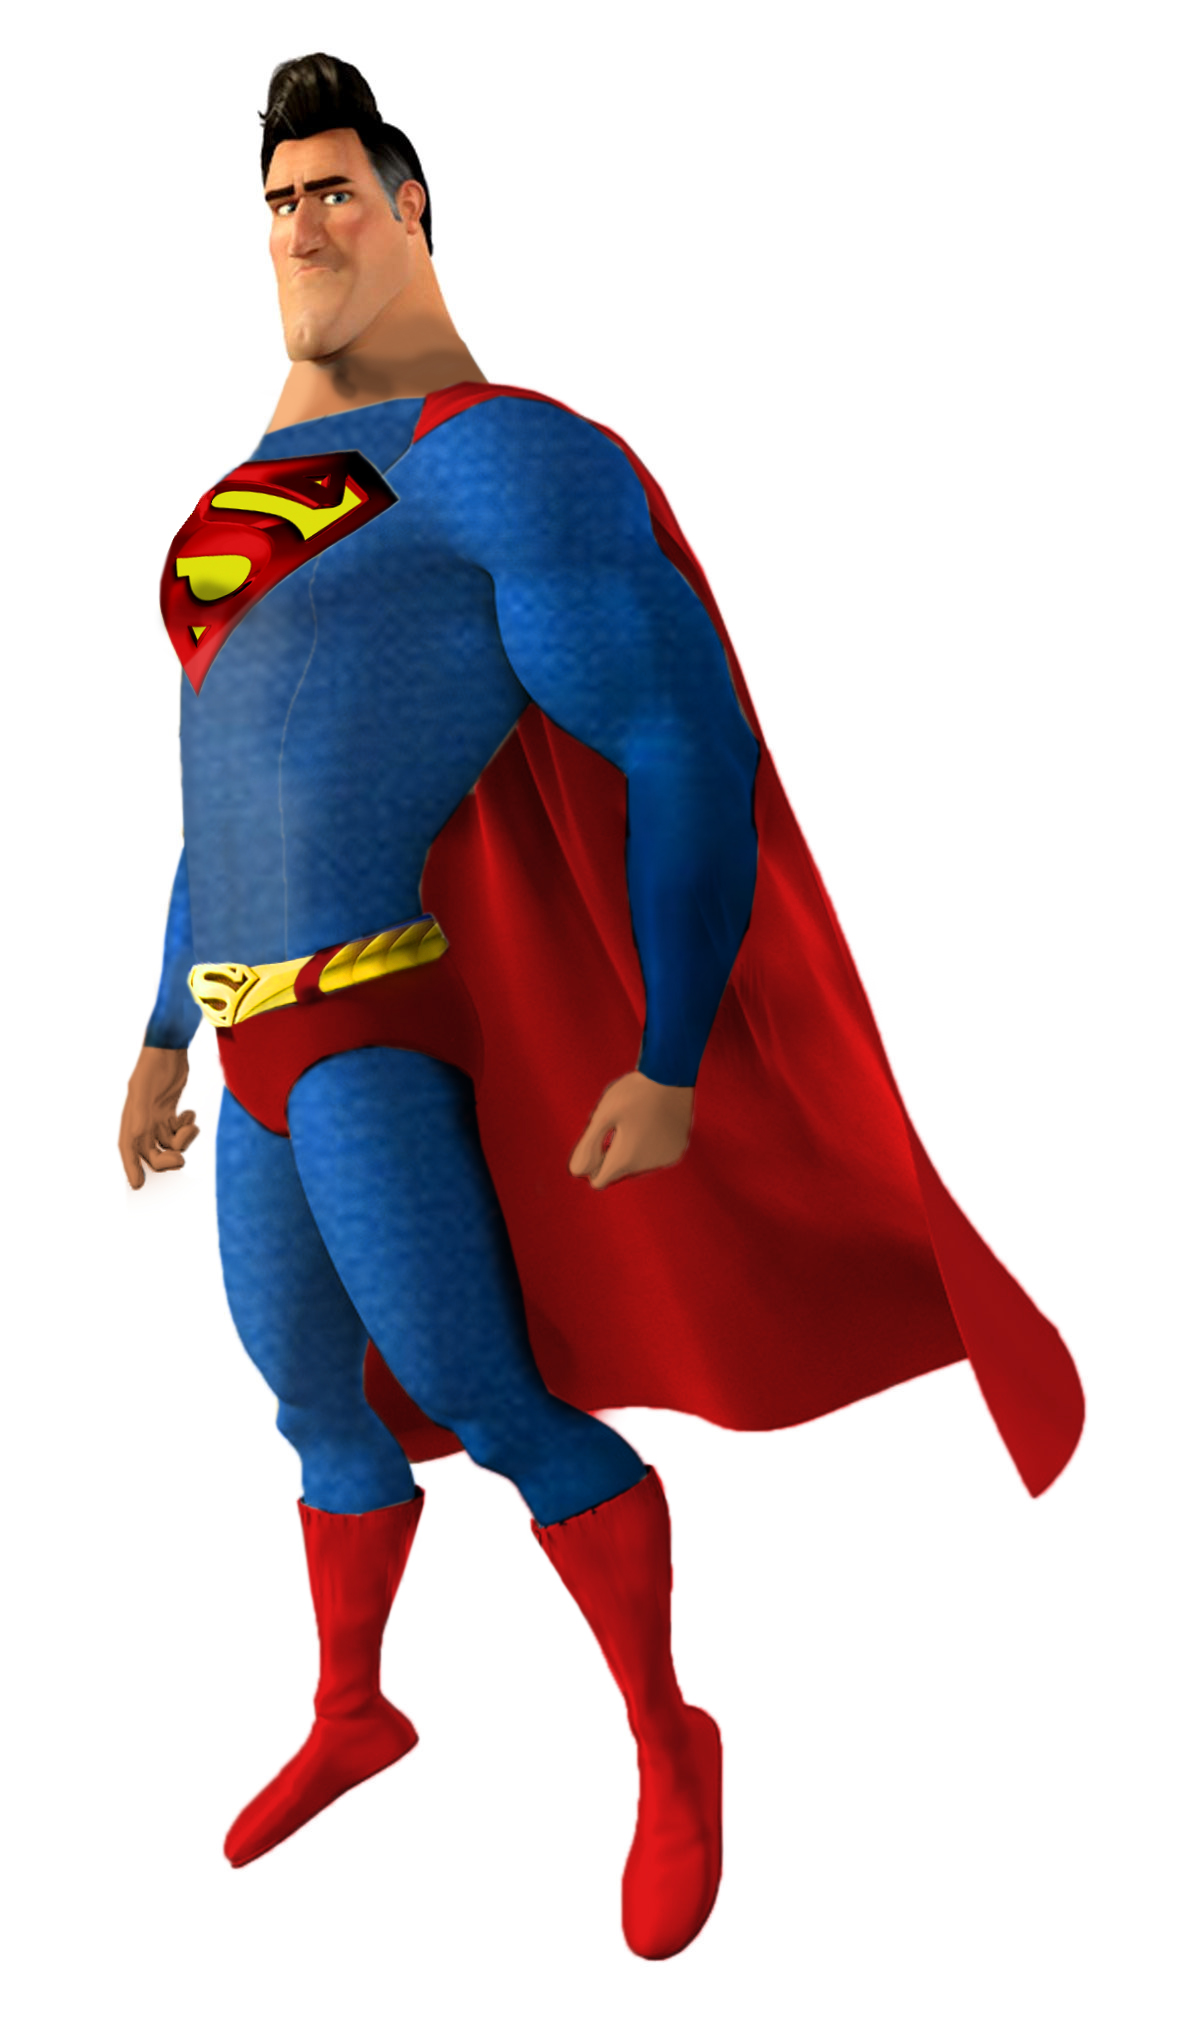 superman_metro_man_by_tcassisbr-d34a82g